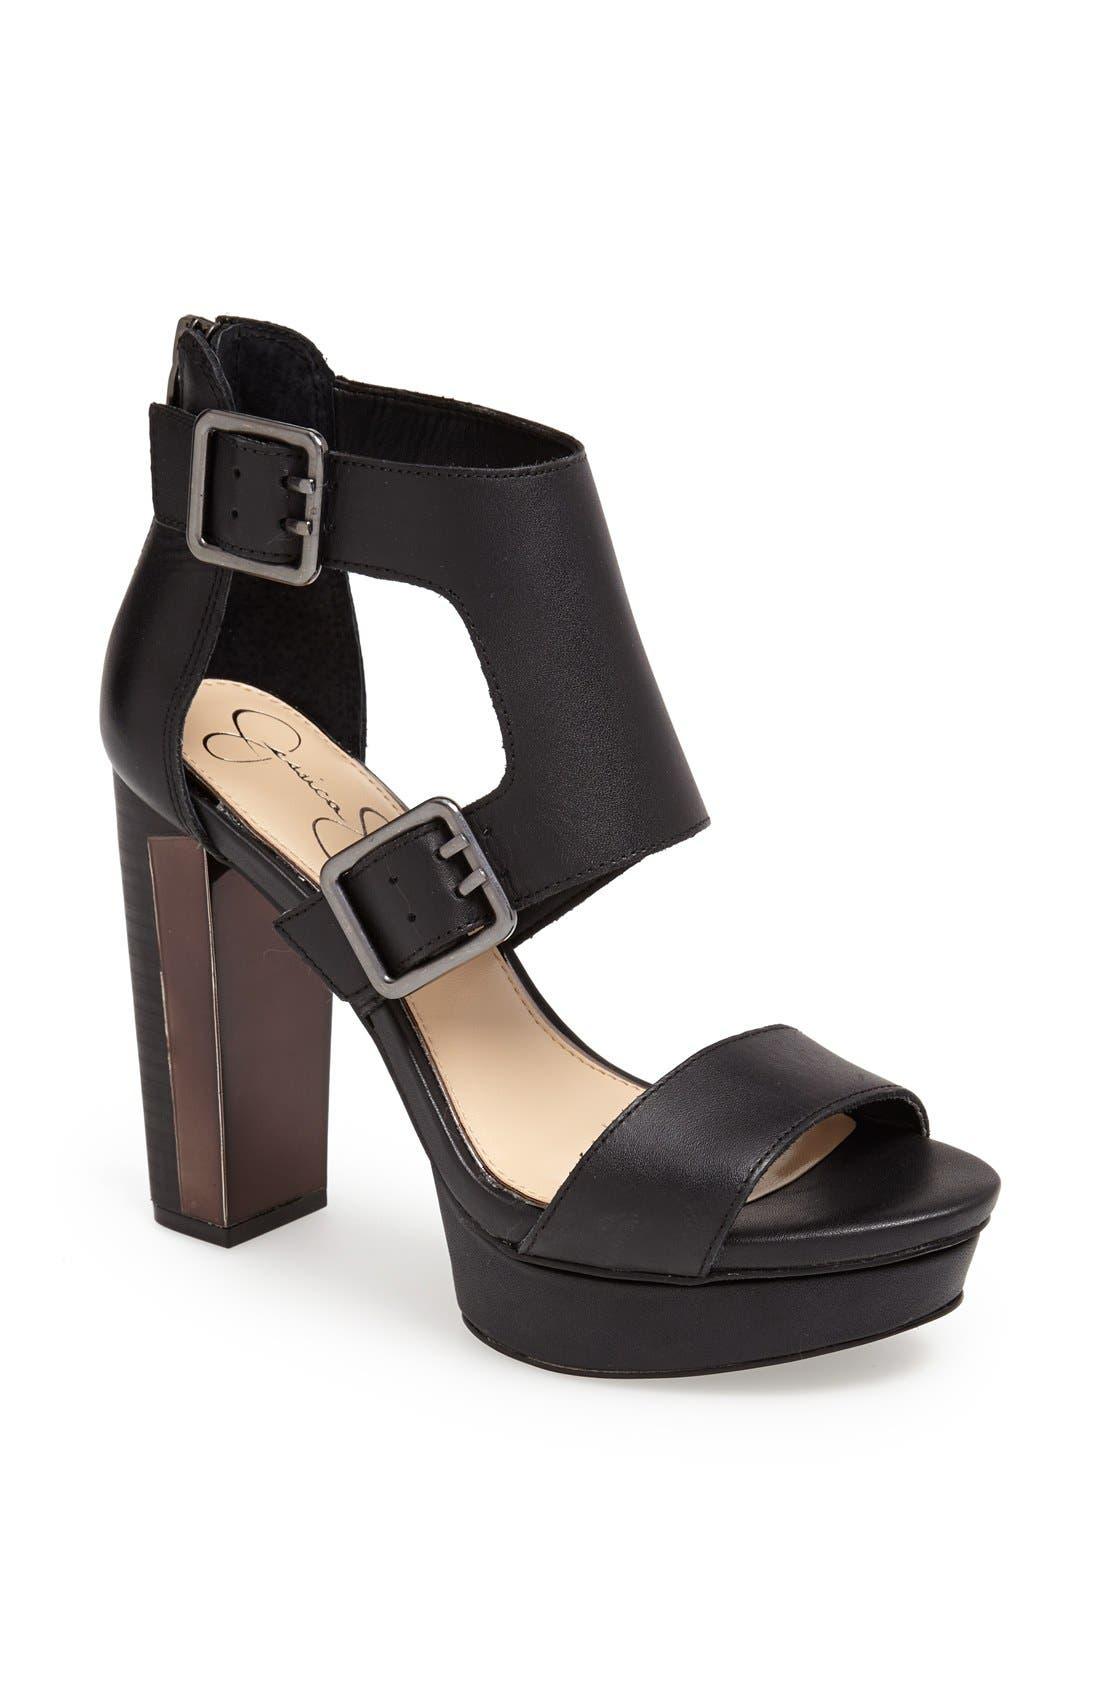 Main Image - Jessica Simpson 'Kaitzz' Sandal